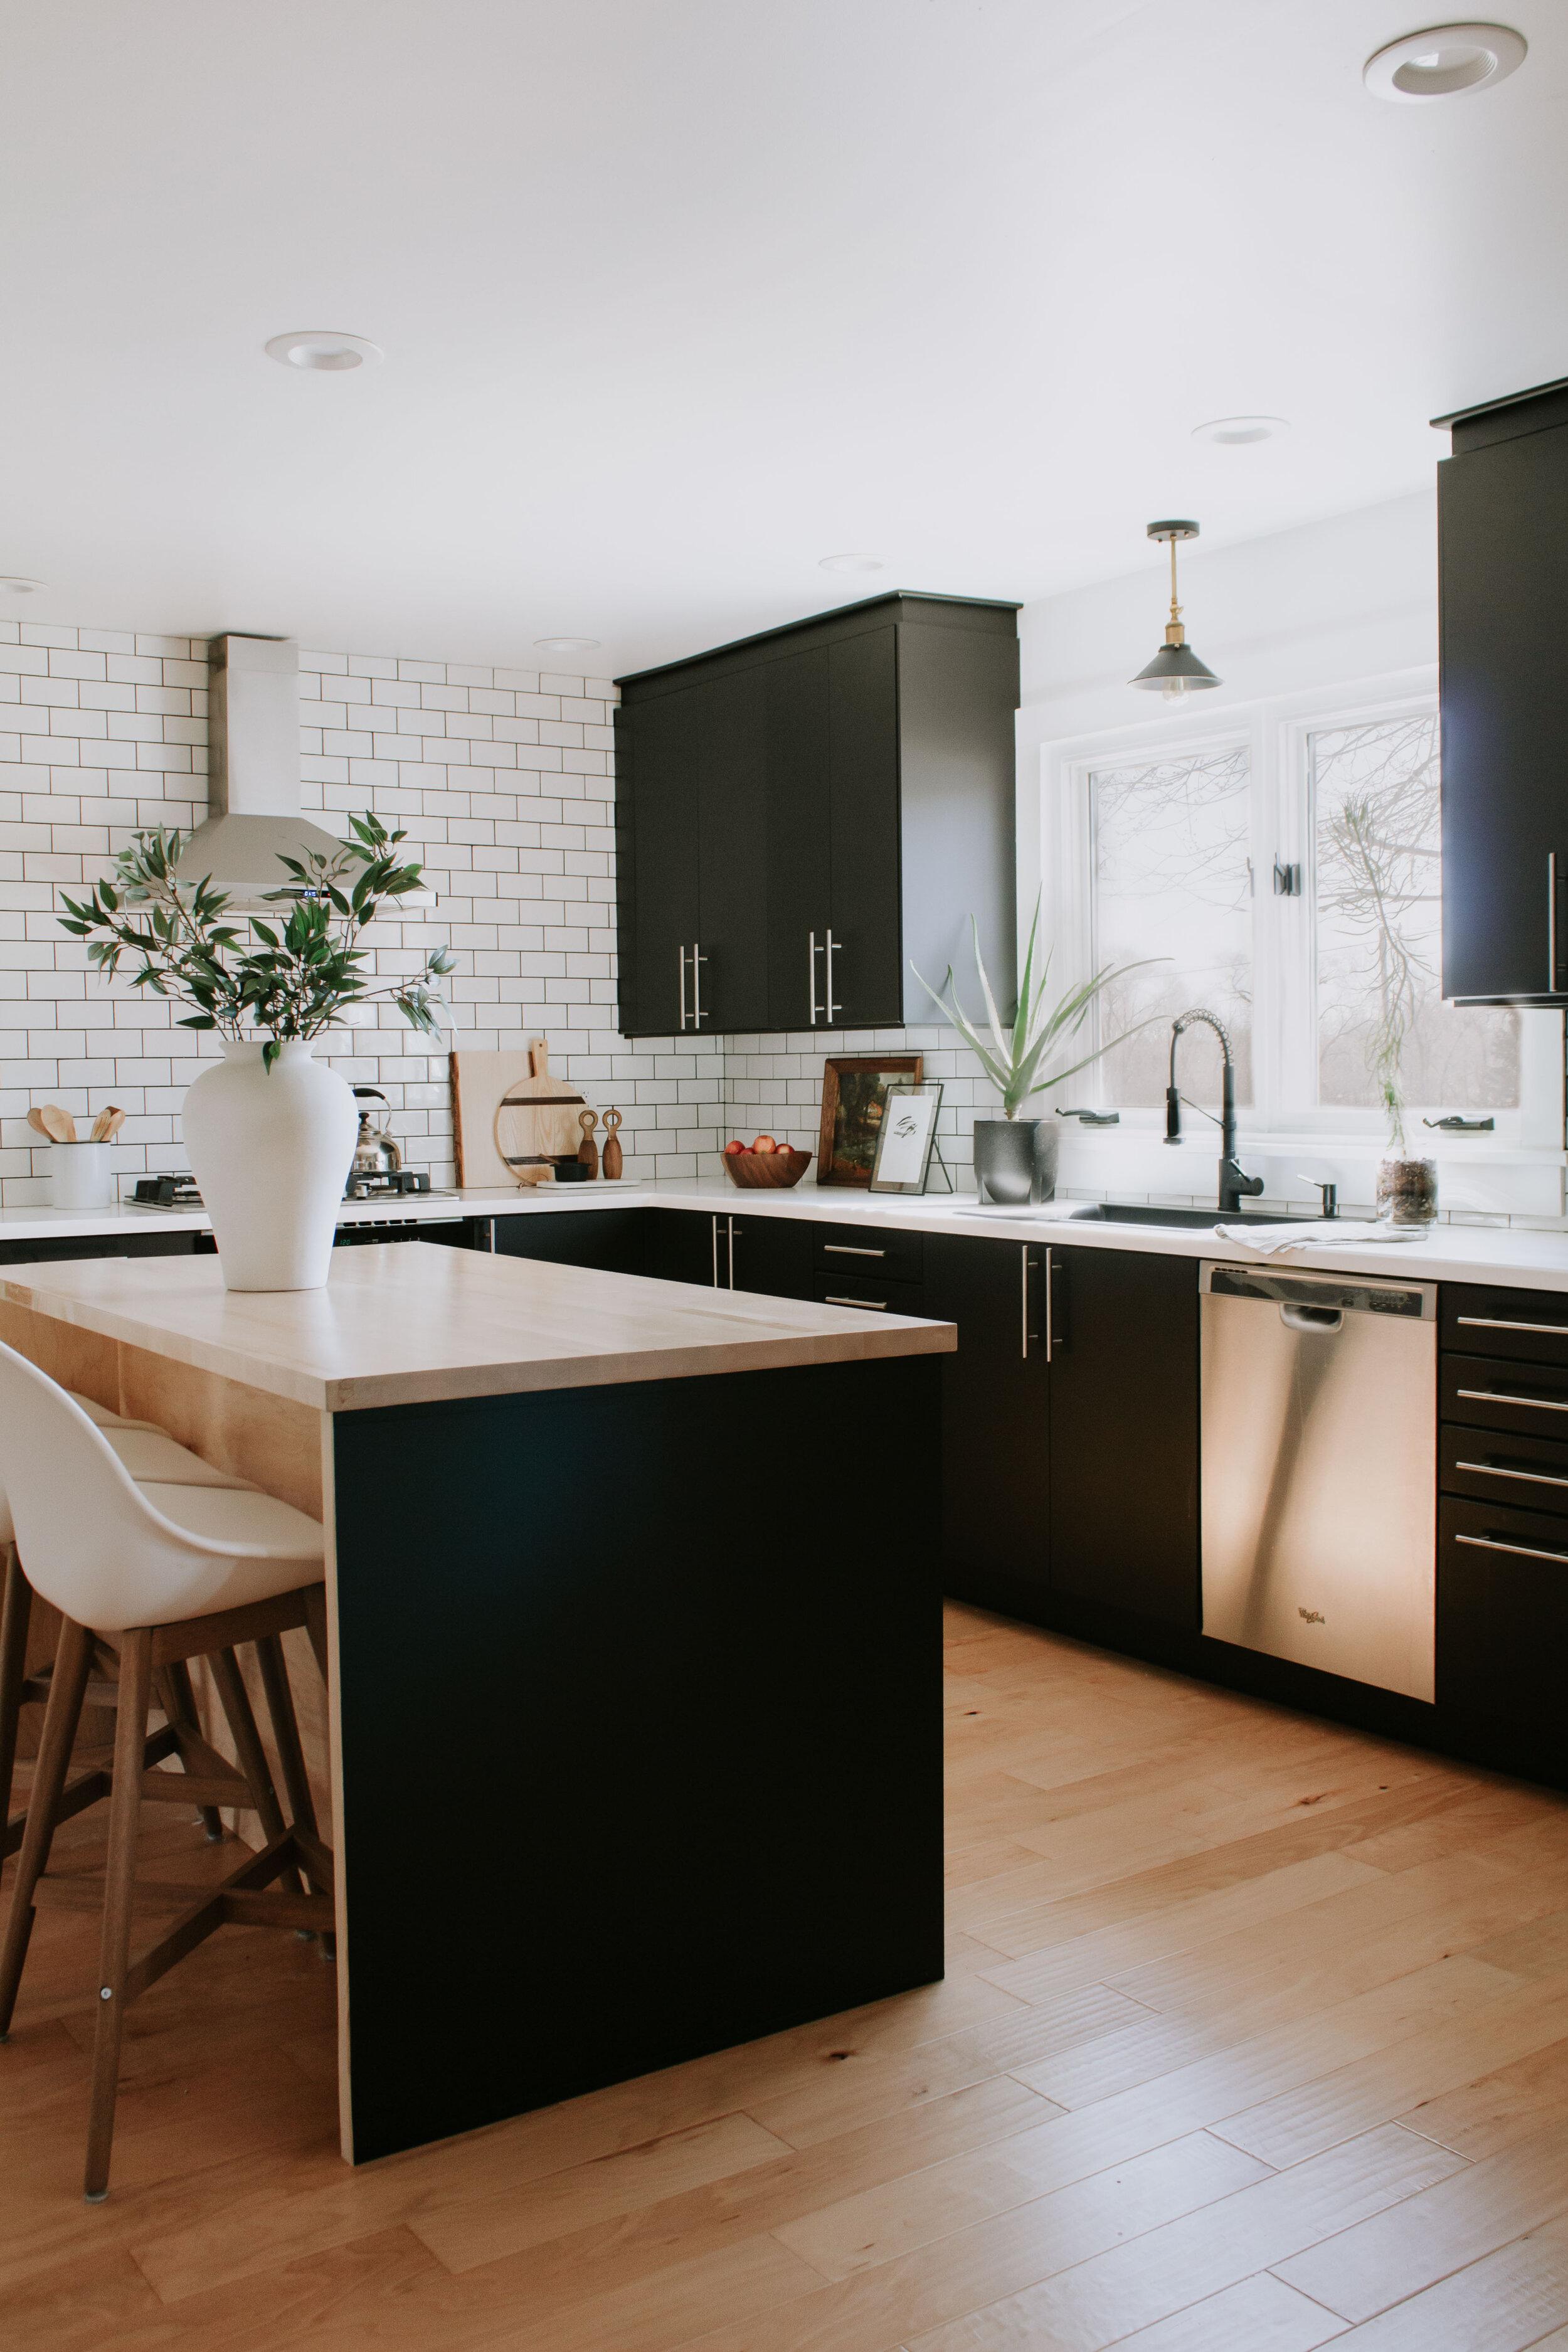 ikea kitchen cabinets q a part 2